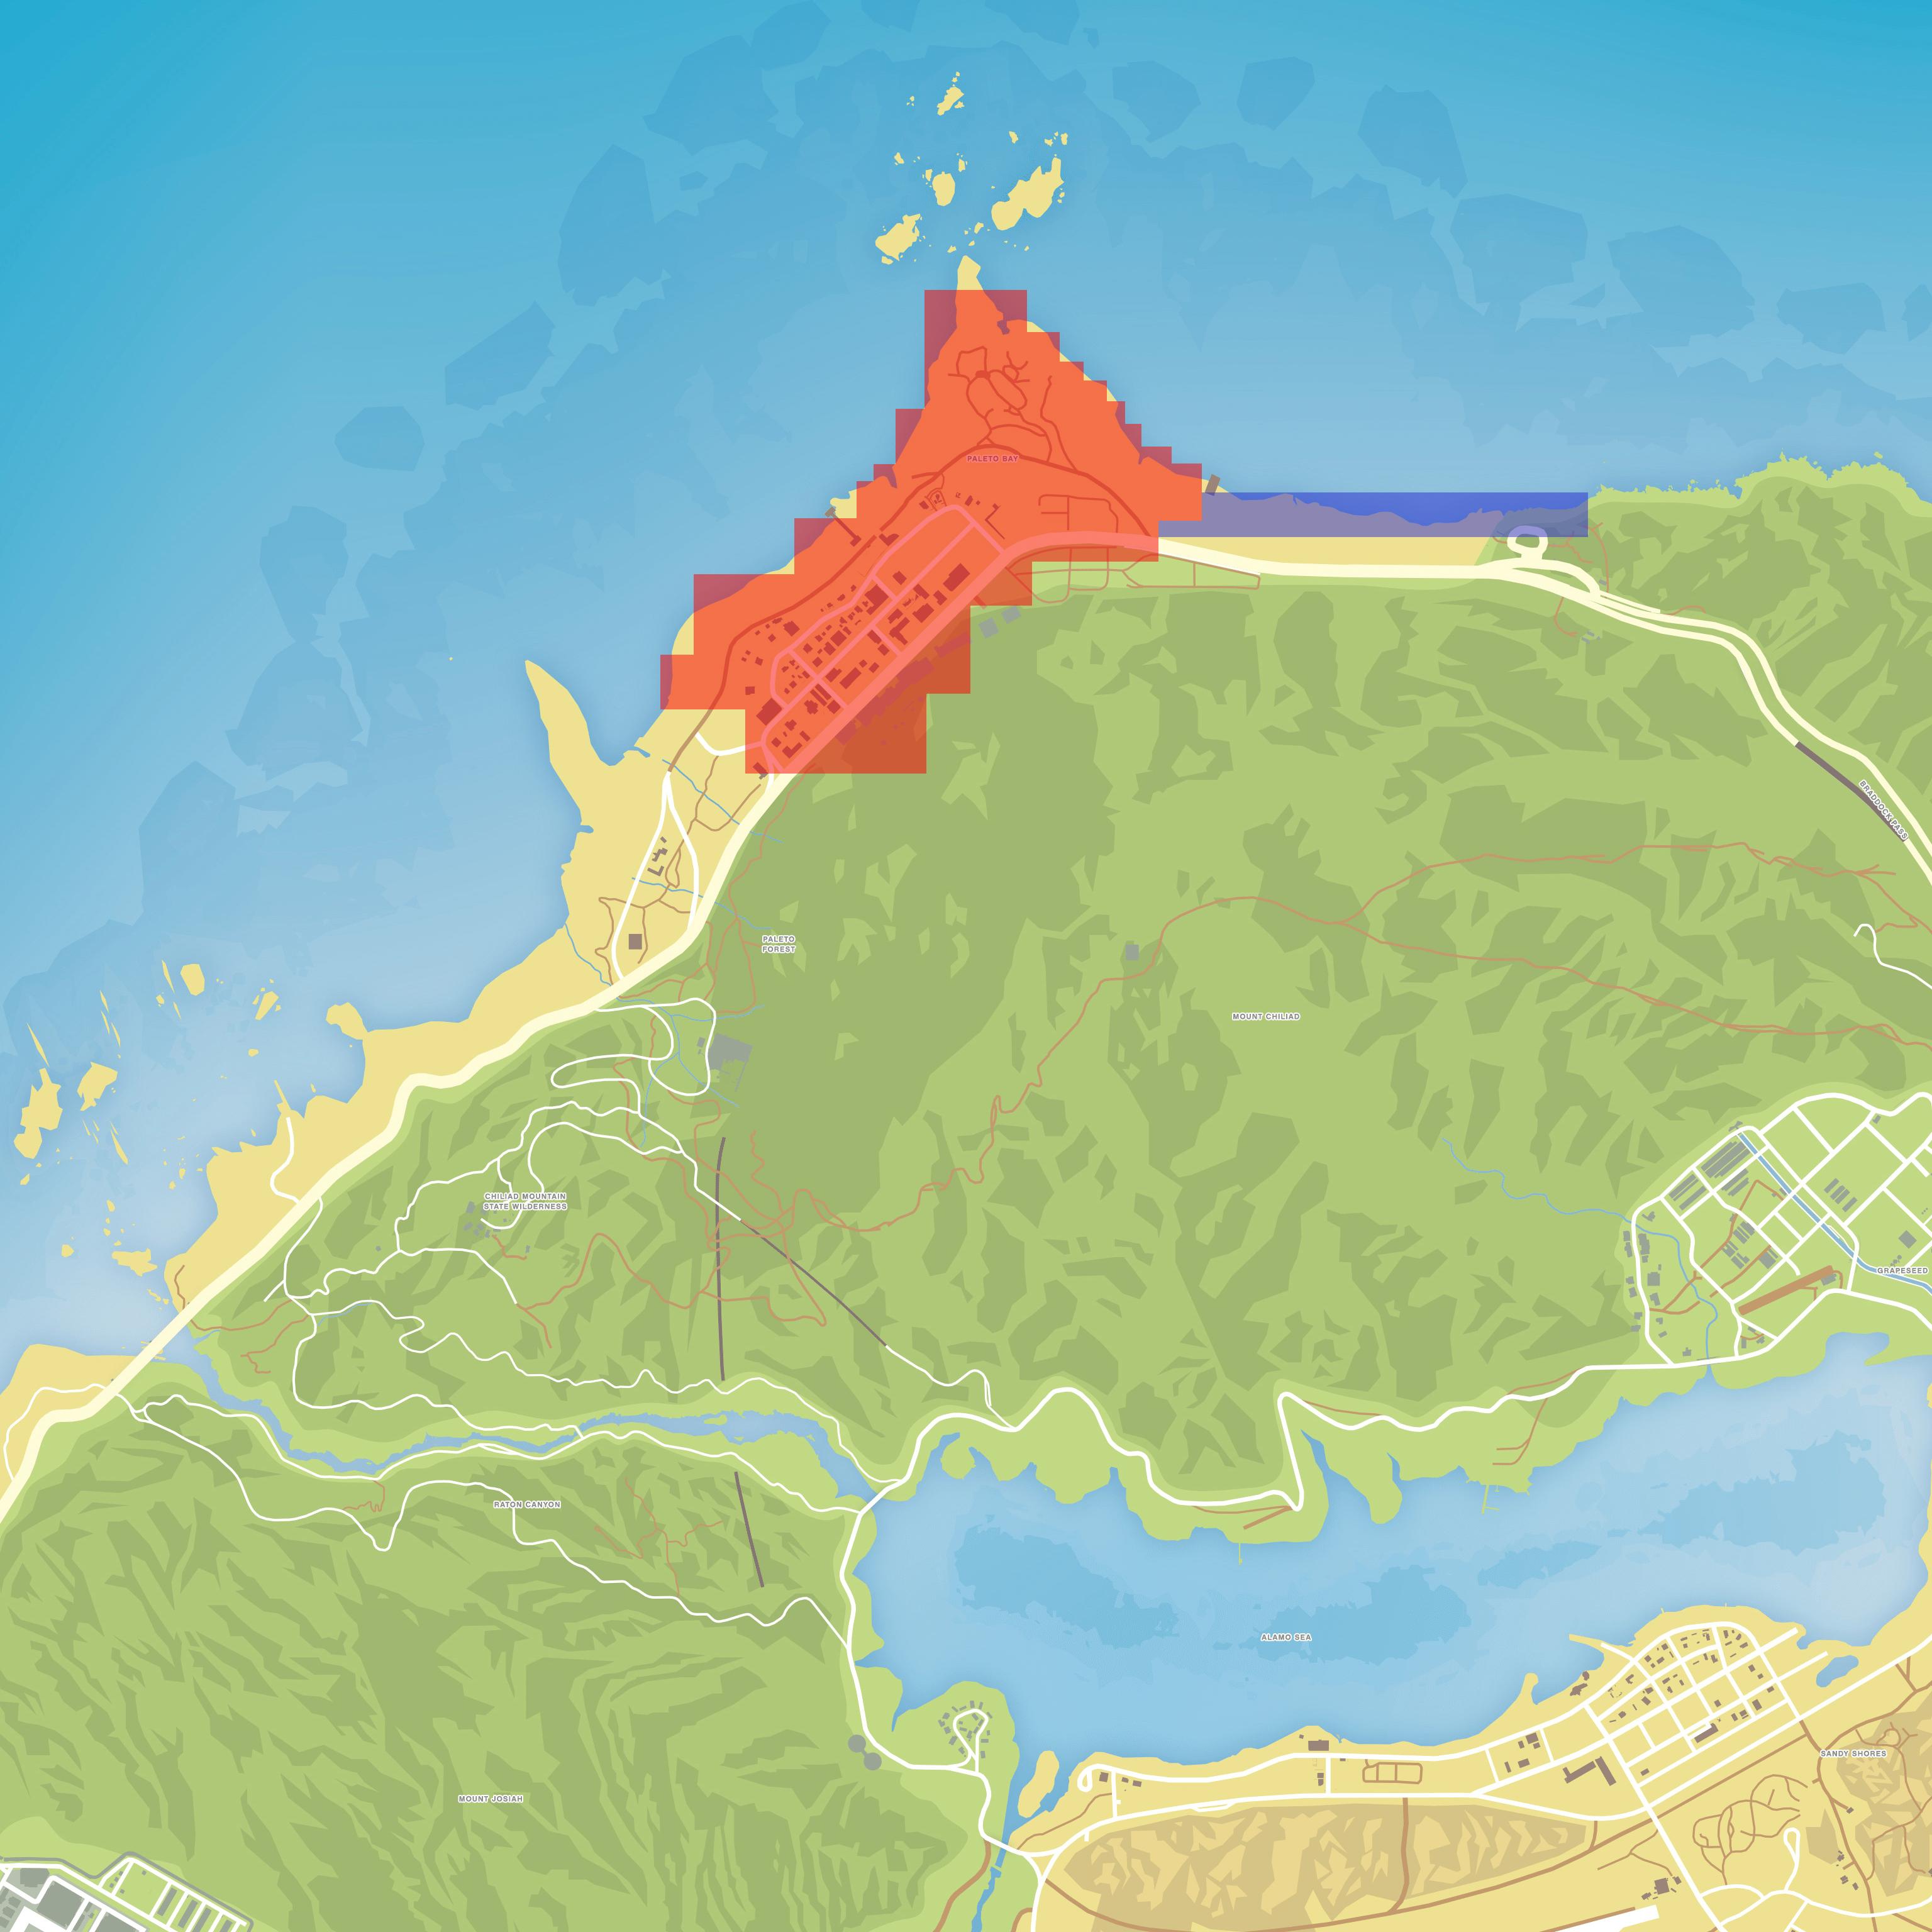 Paleto Bay Gta Wiki Fandom